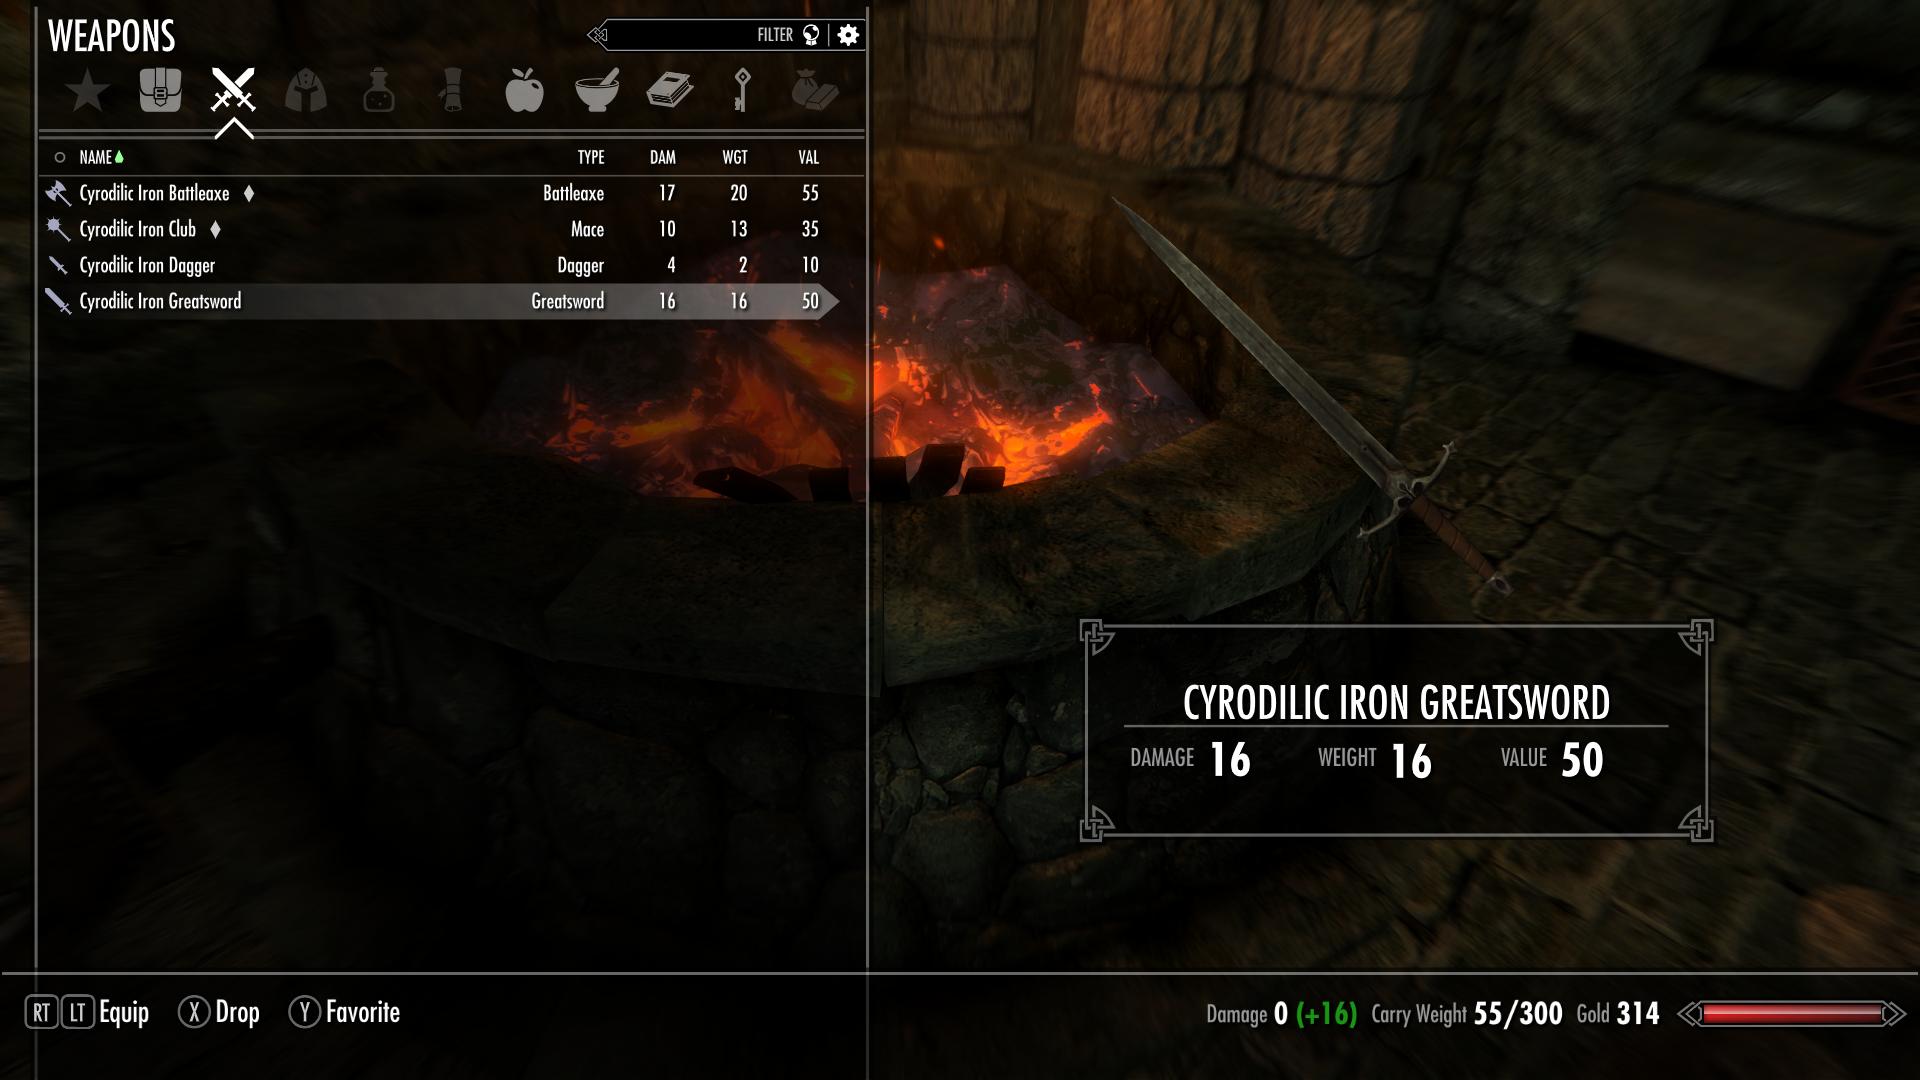 Cyrodilic Iron Greatsword